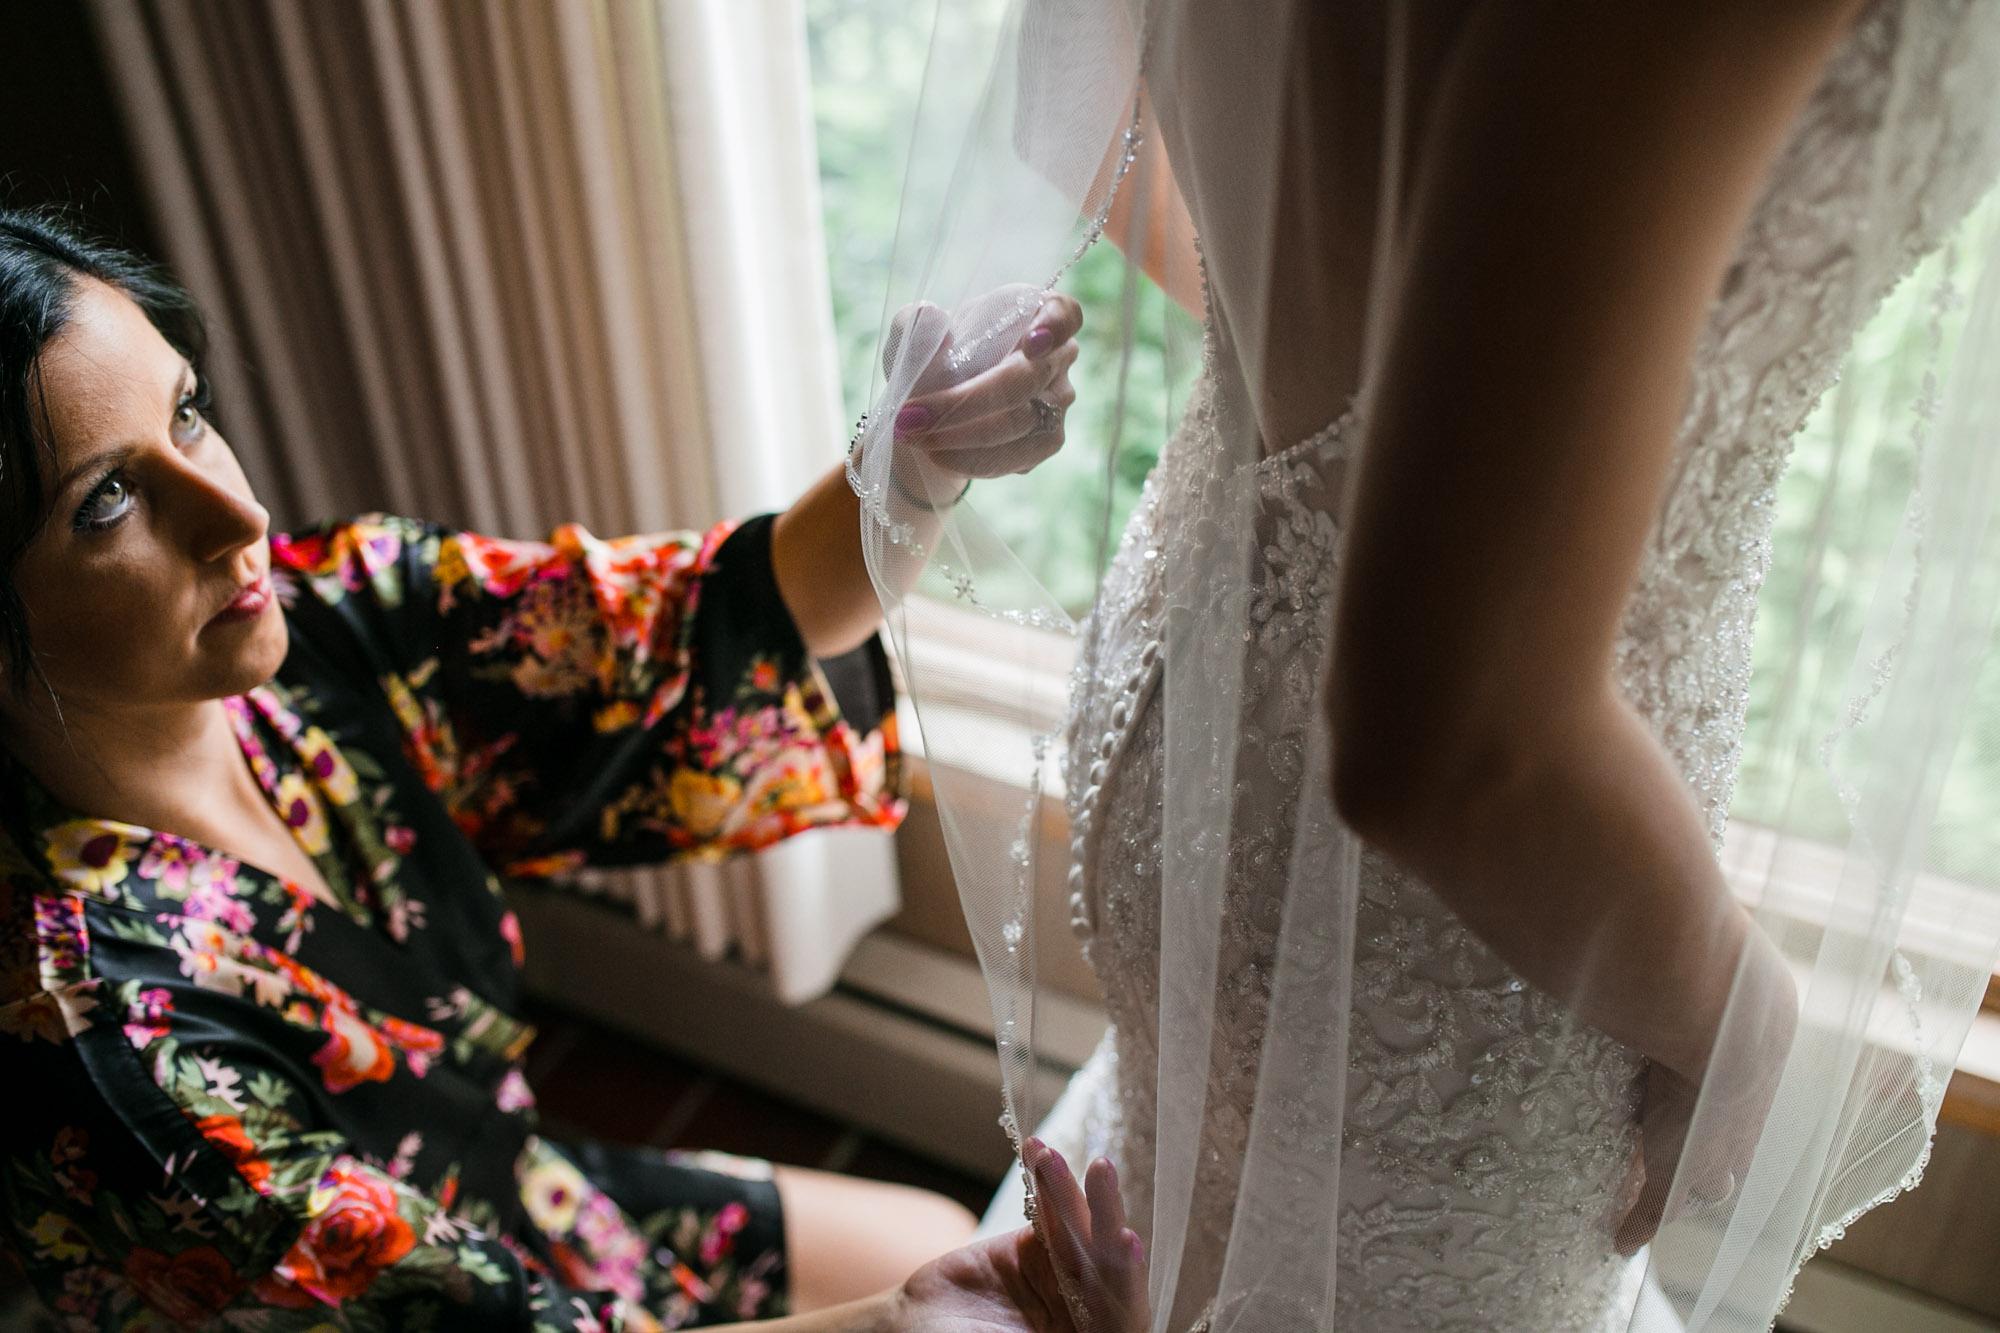 hensville-wedding-downtown-toledo-ohio (9 of 103).jpg